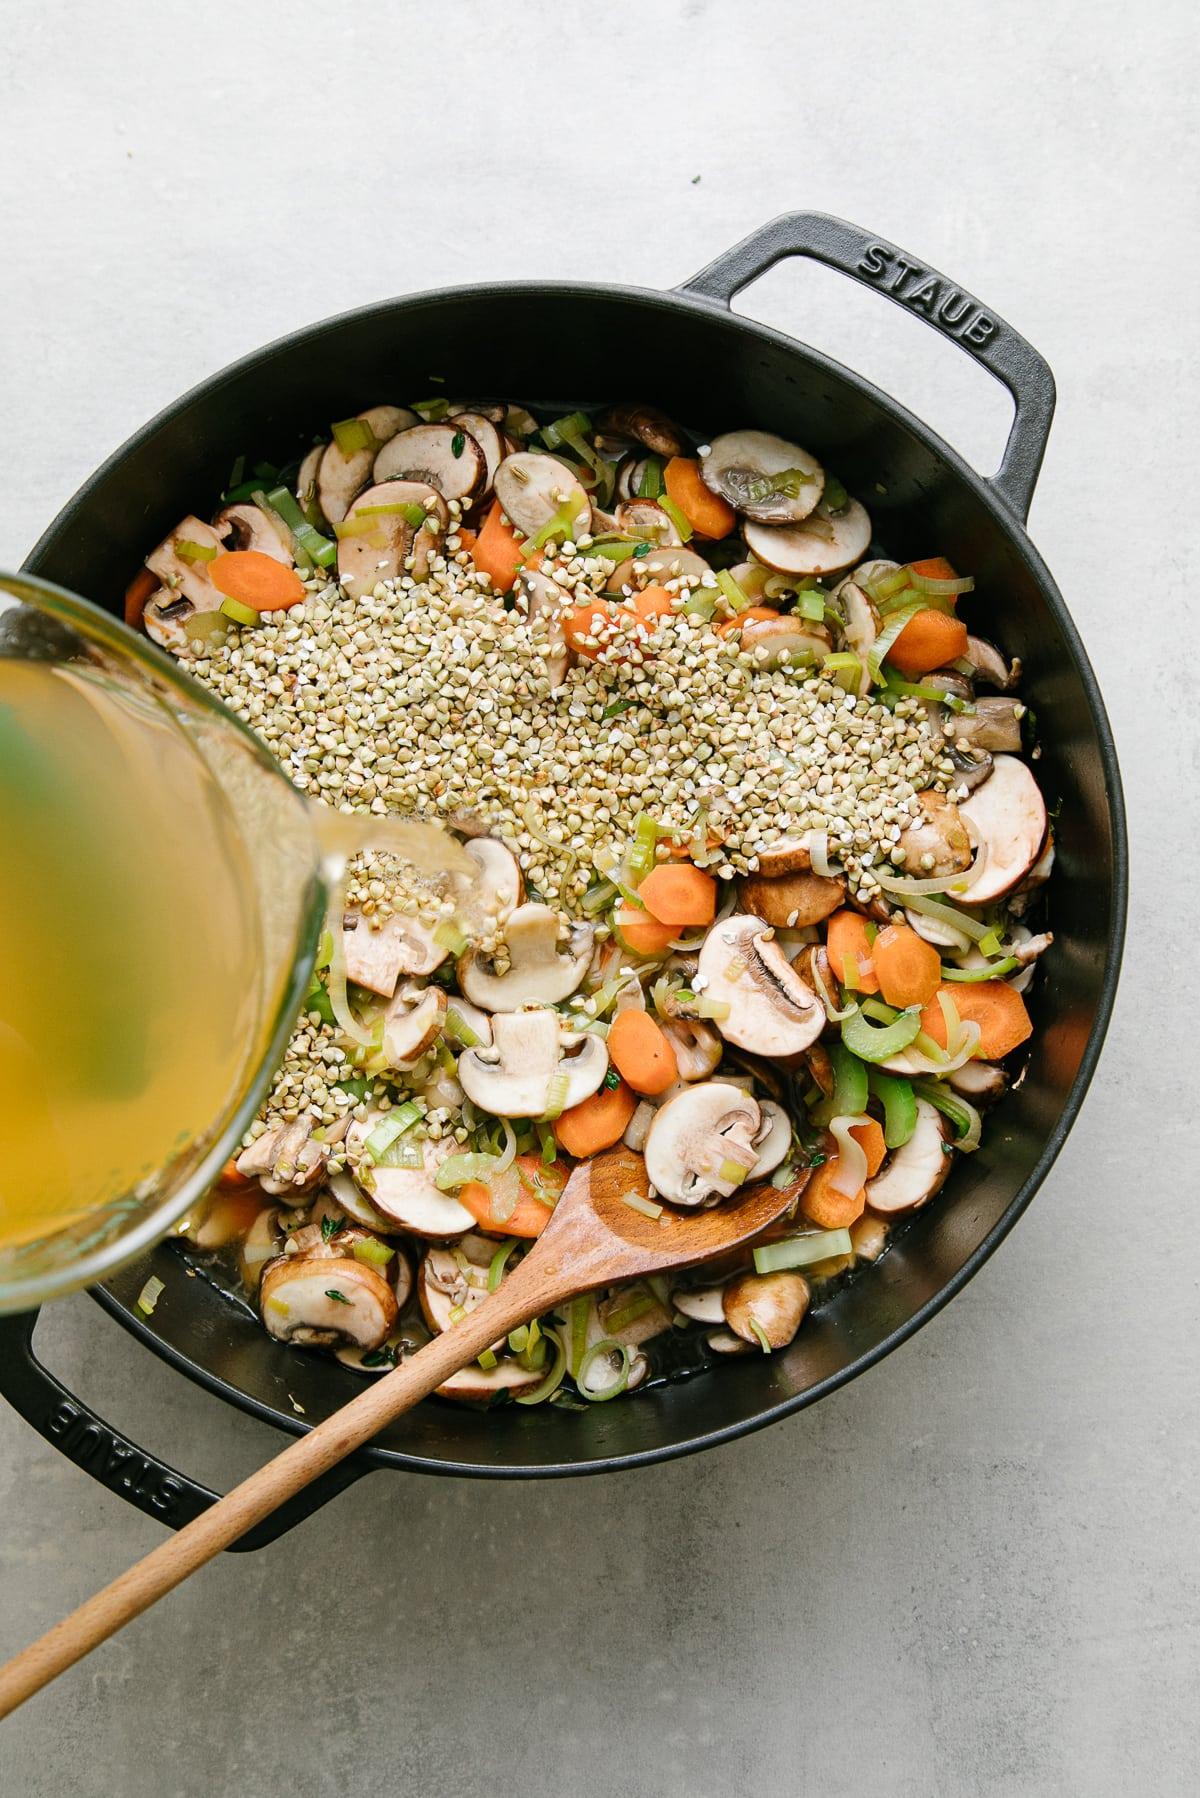 top down view showing the process of adding liquids to pot of veggies to make mushroom buckwheat soup.